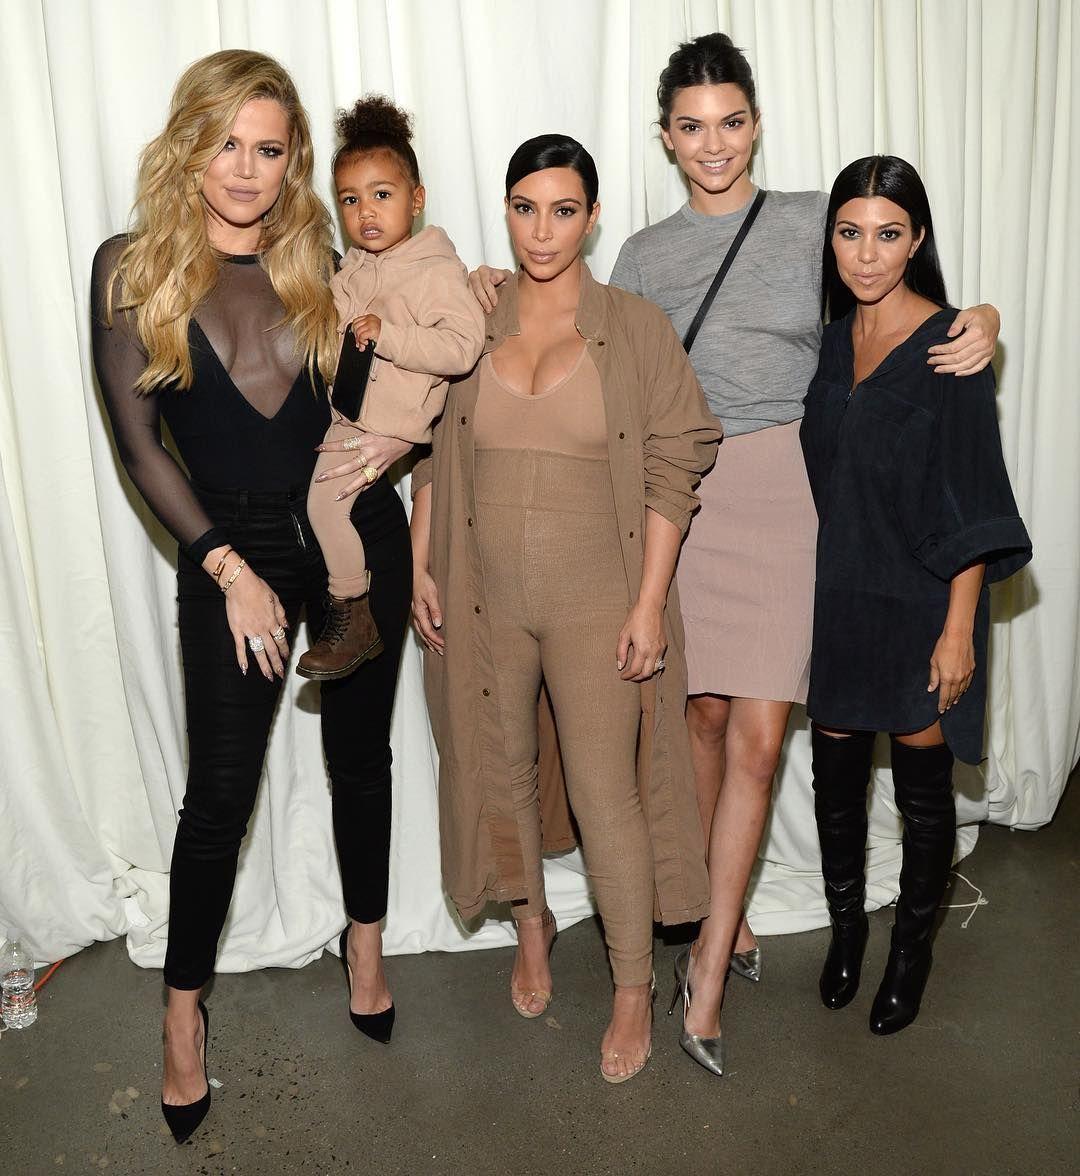 Kim Kardashian Blasts Kris Jenner For Encouraging Khloe To: Pin By M. Woods On Inspirational